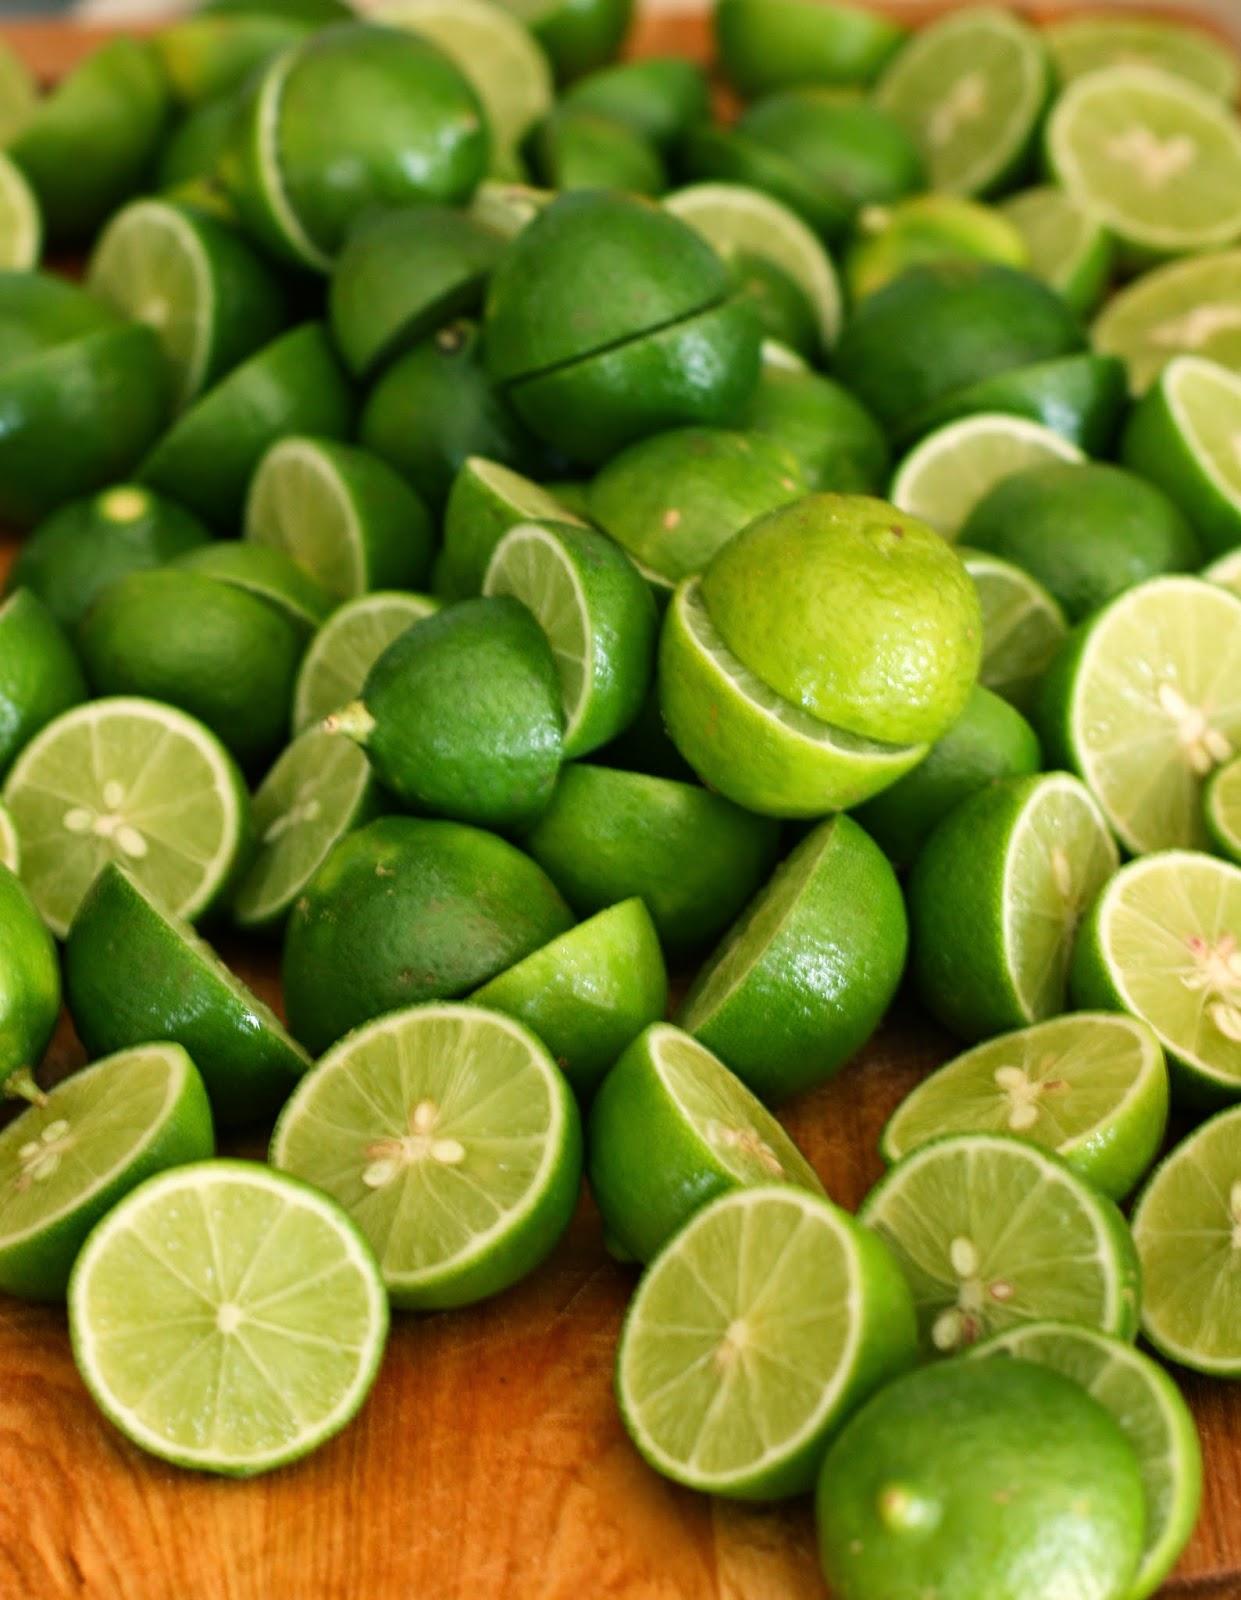 Peruvian lime